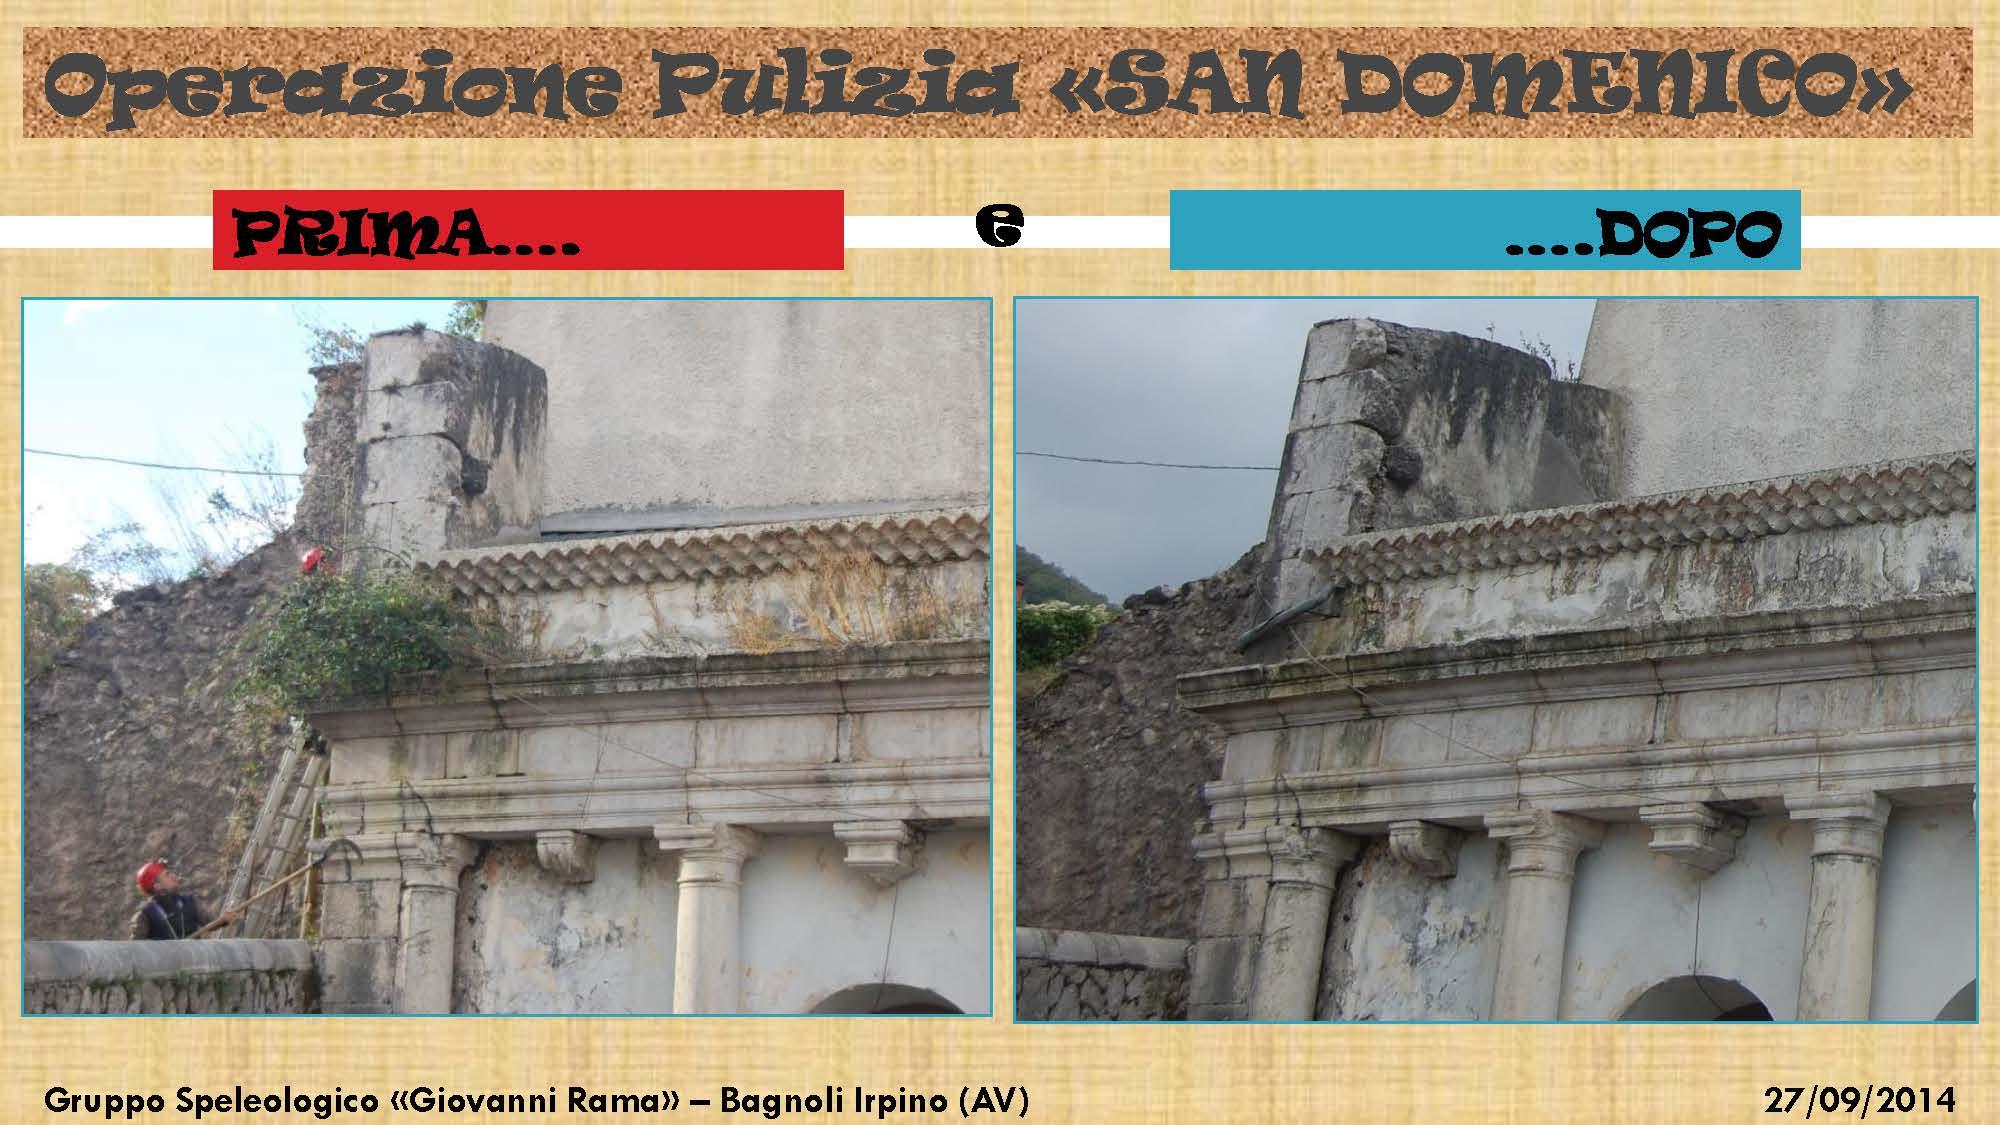 Bagnoli-Pulizia-San-Domenico-2014_Pagina_03